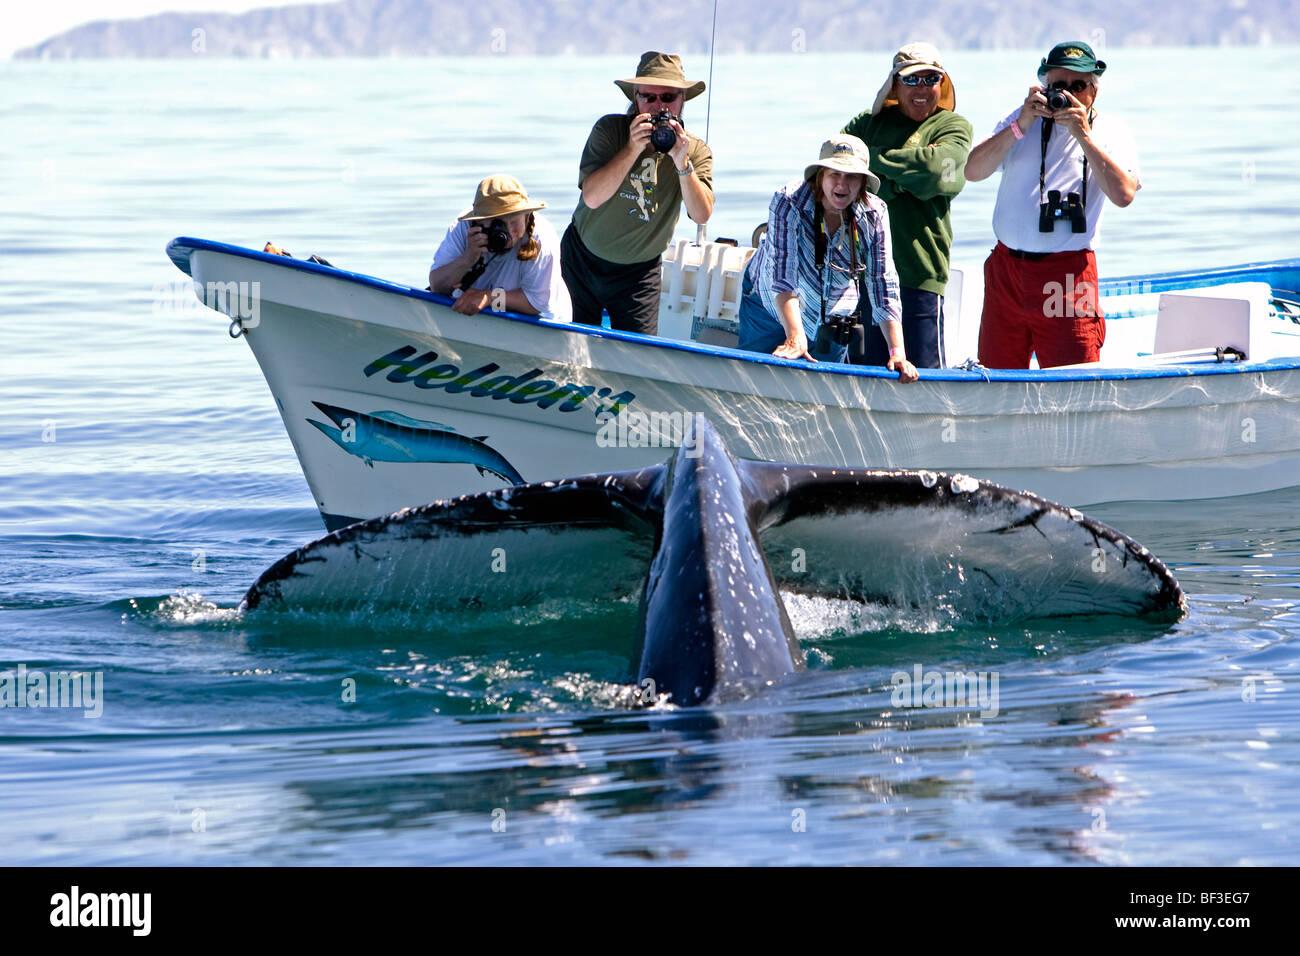 Buckelwal (Impressionen Novaeangliae). Wal-Beobachter Tauchen Wale beobachten. Stockbild